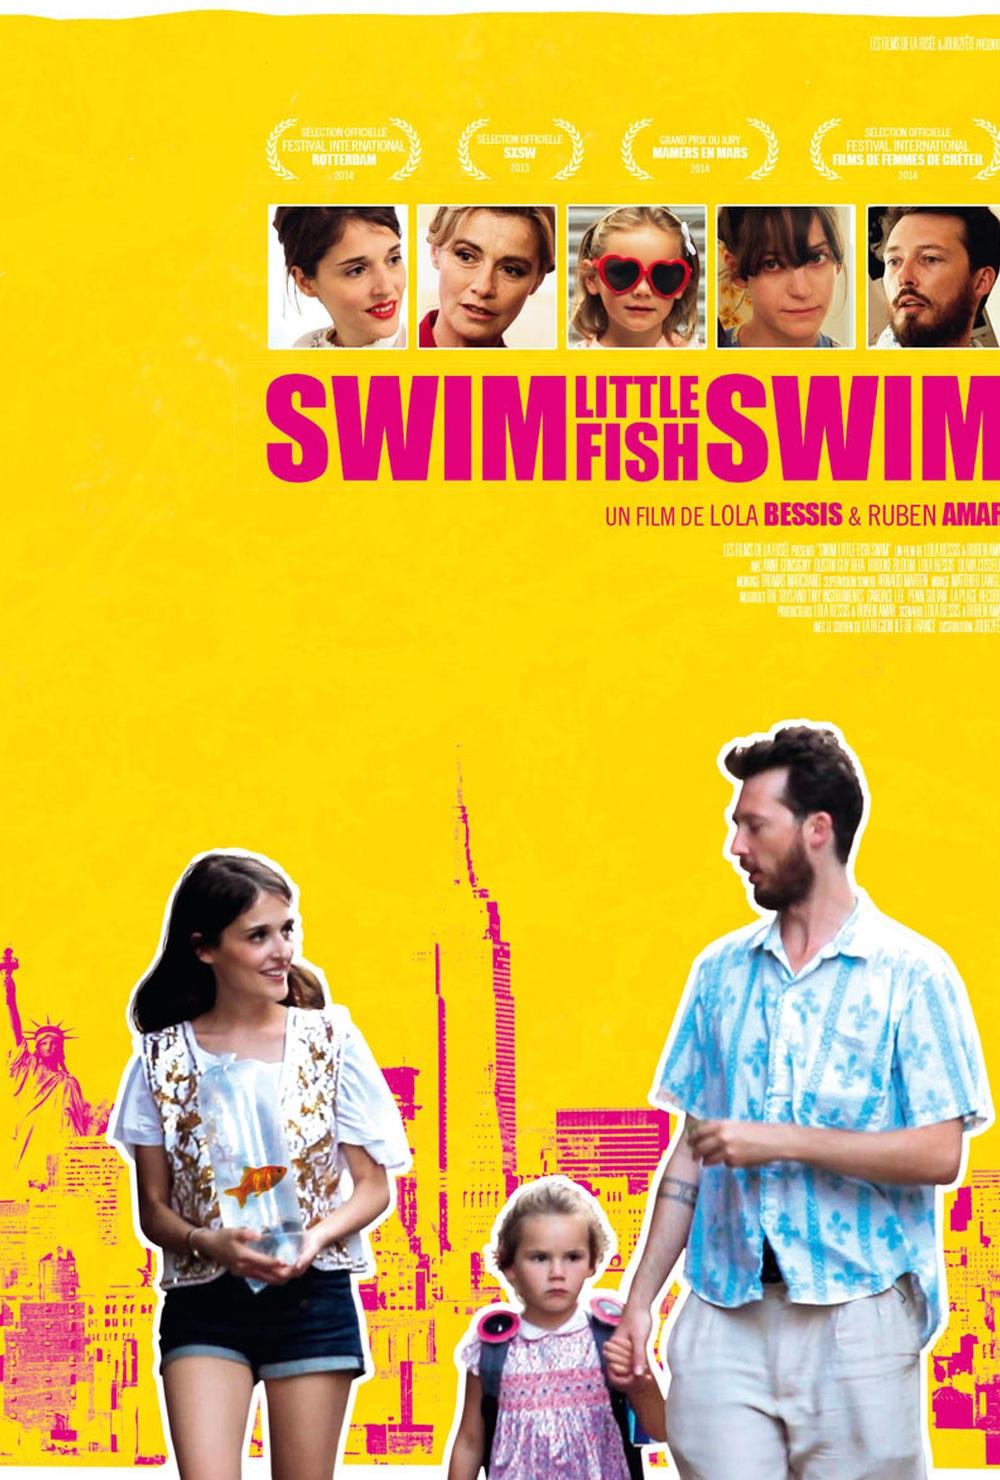 swim_little_fish.jpg